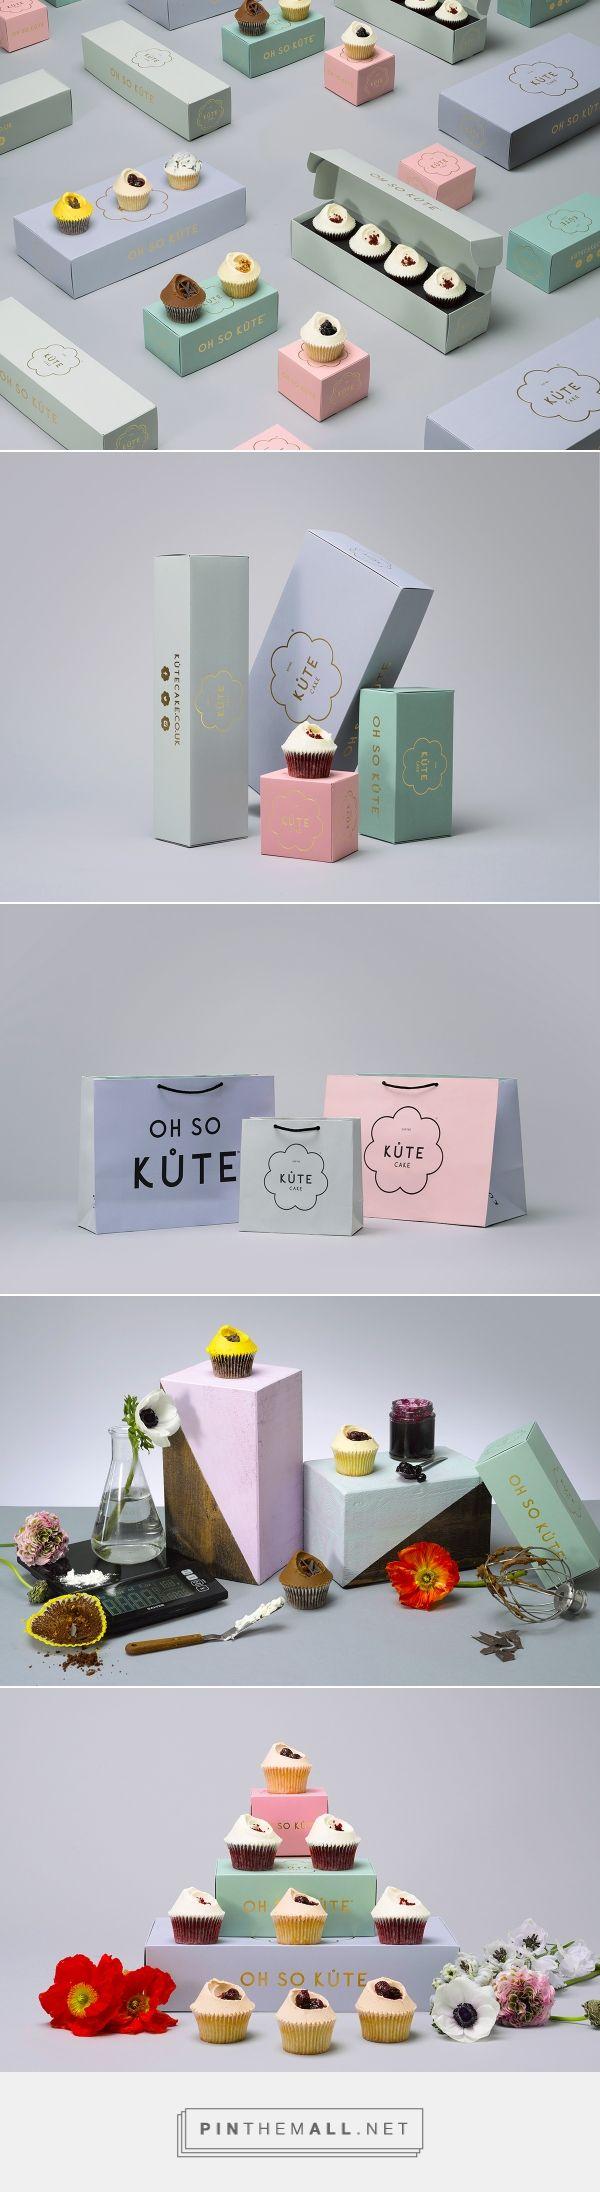 Kute Cake / Kute Cake are an artisan cupcake start-up based in East London…